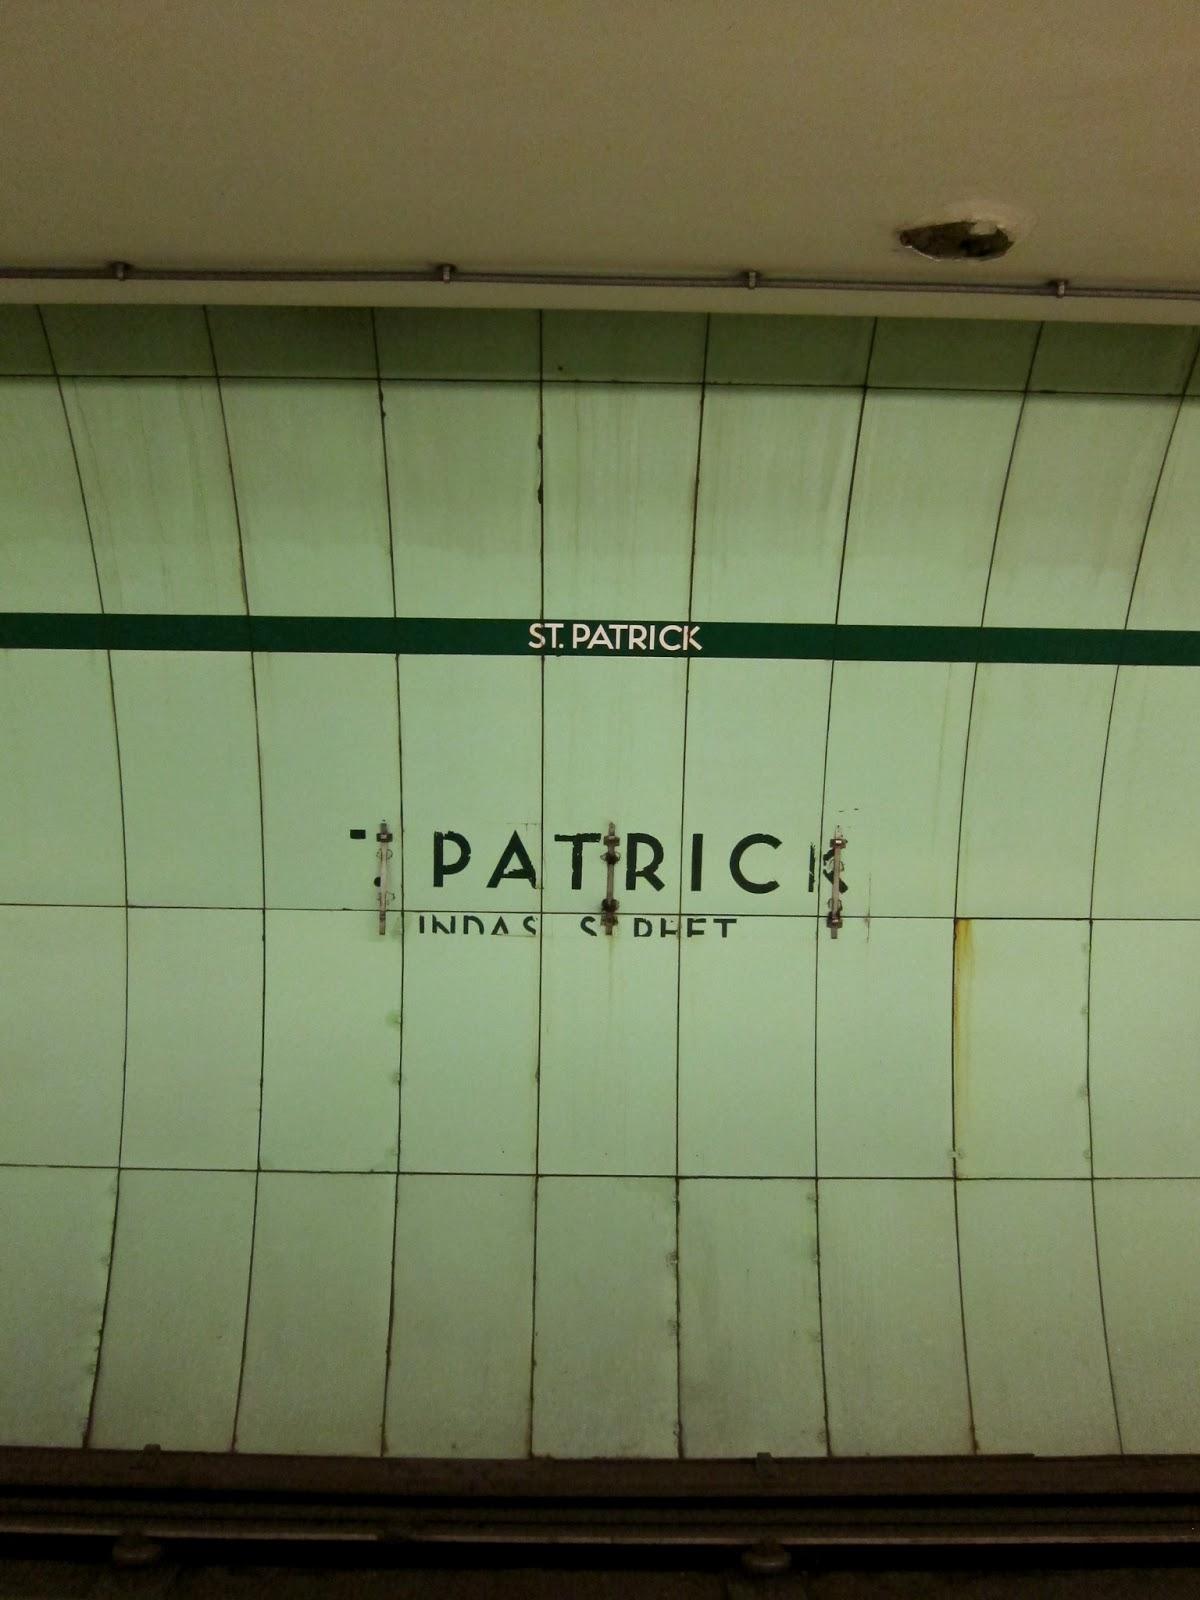 St. Patrick station platform wall